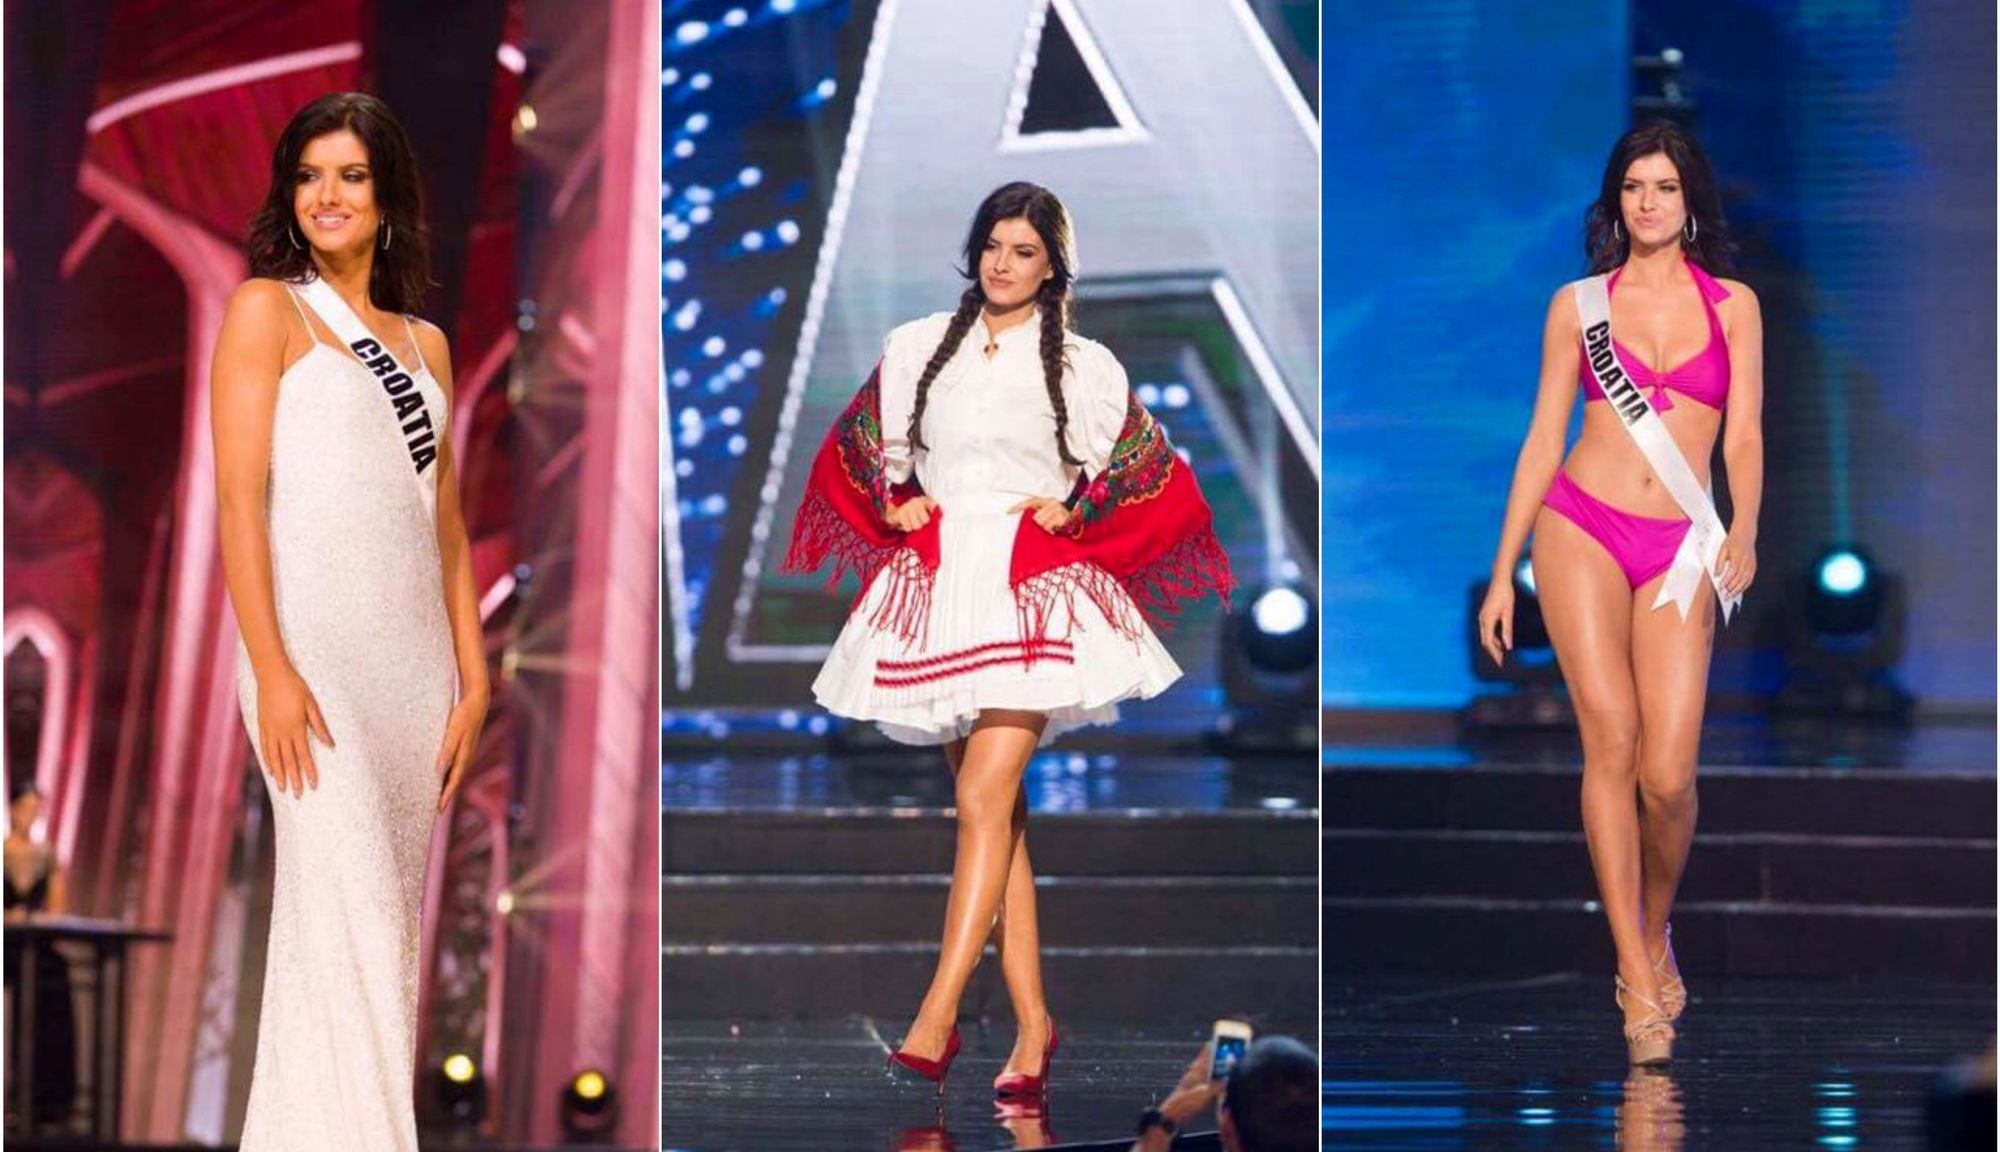 Miss Universe 2017: Miss Croatia Impresses in National Costume